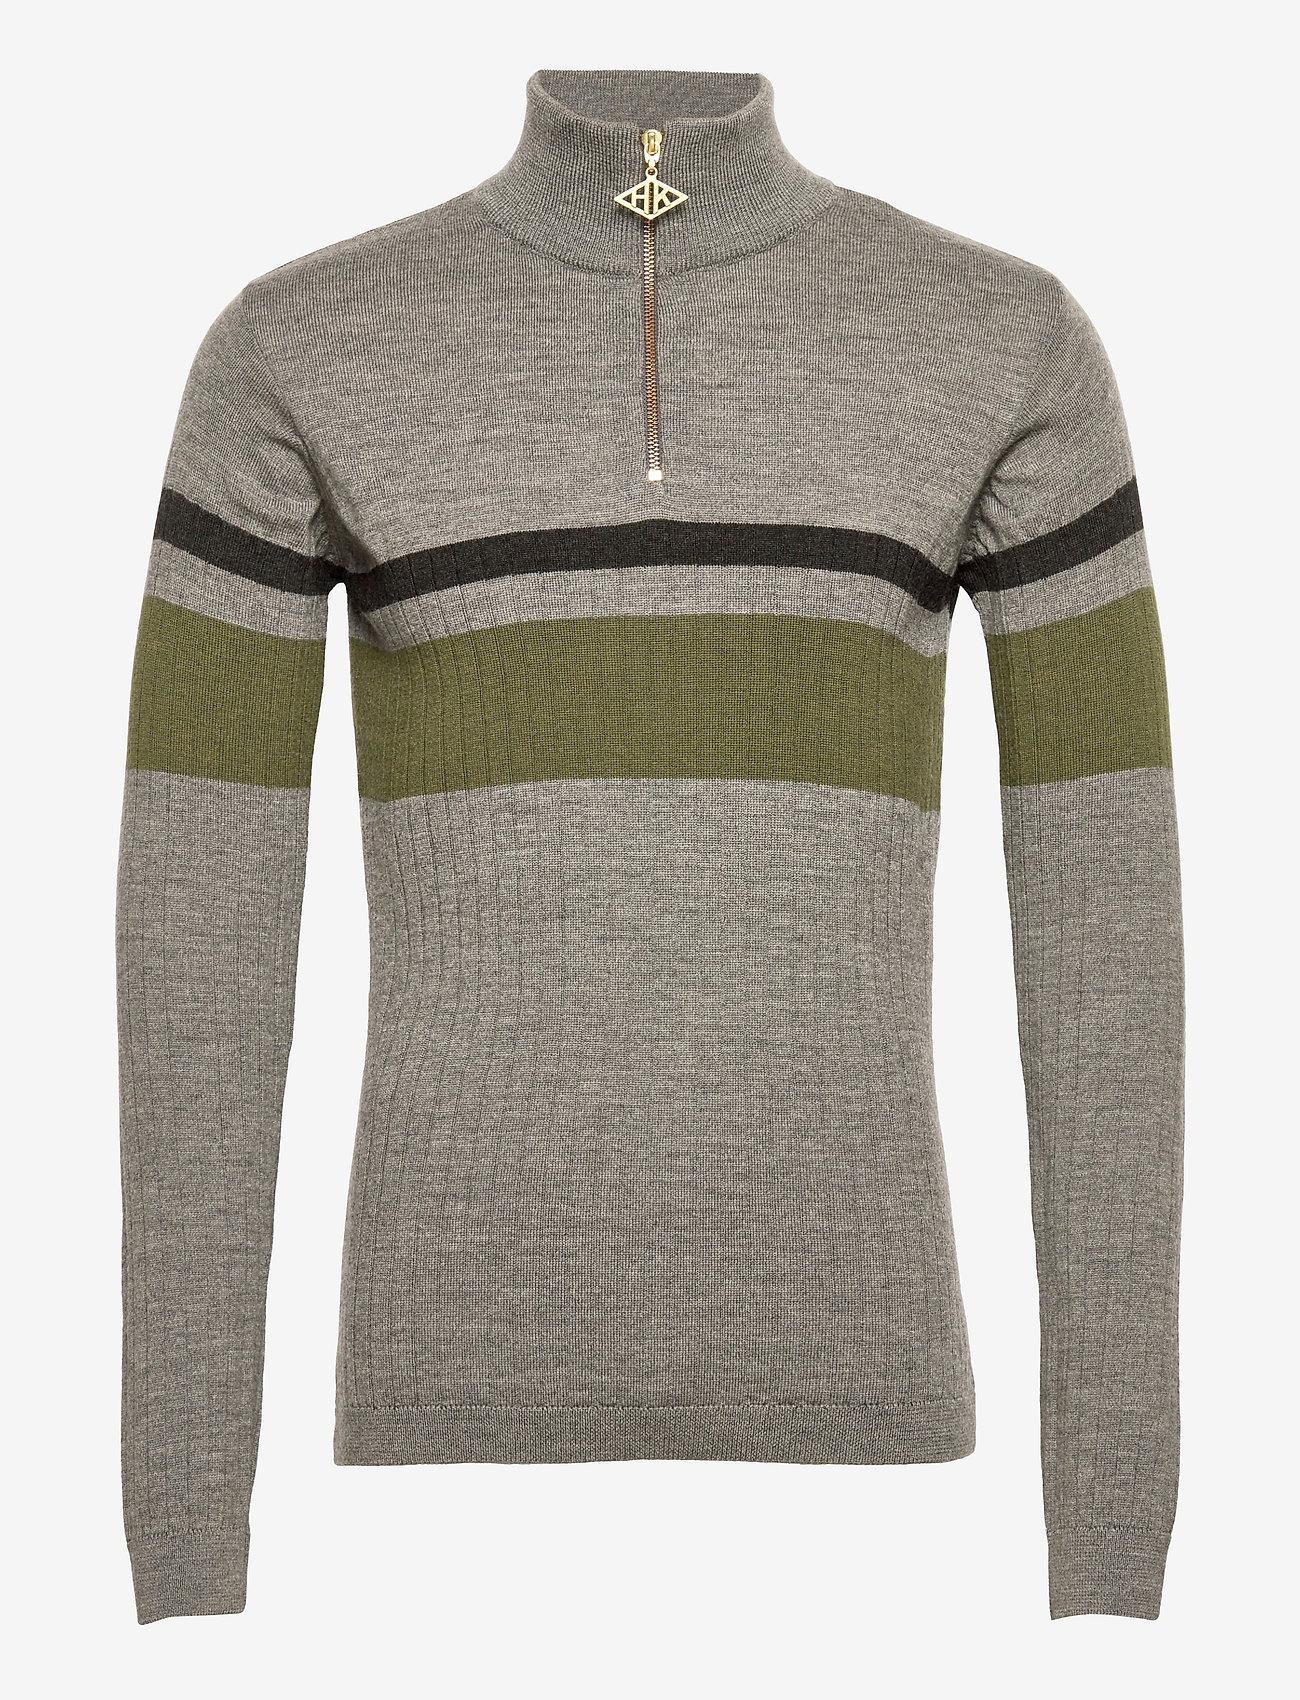 HAN Kjøbenhavn - Half Zip Long Sleeve - truien met halve rits - grey - 0